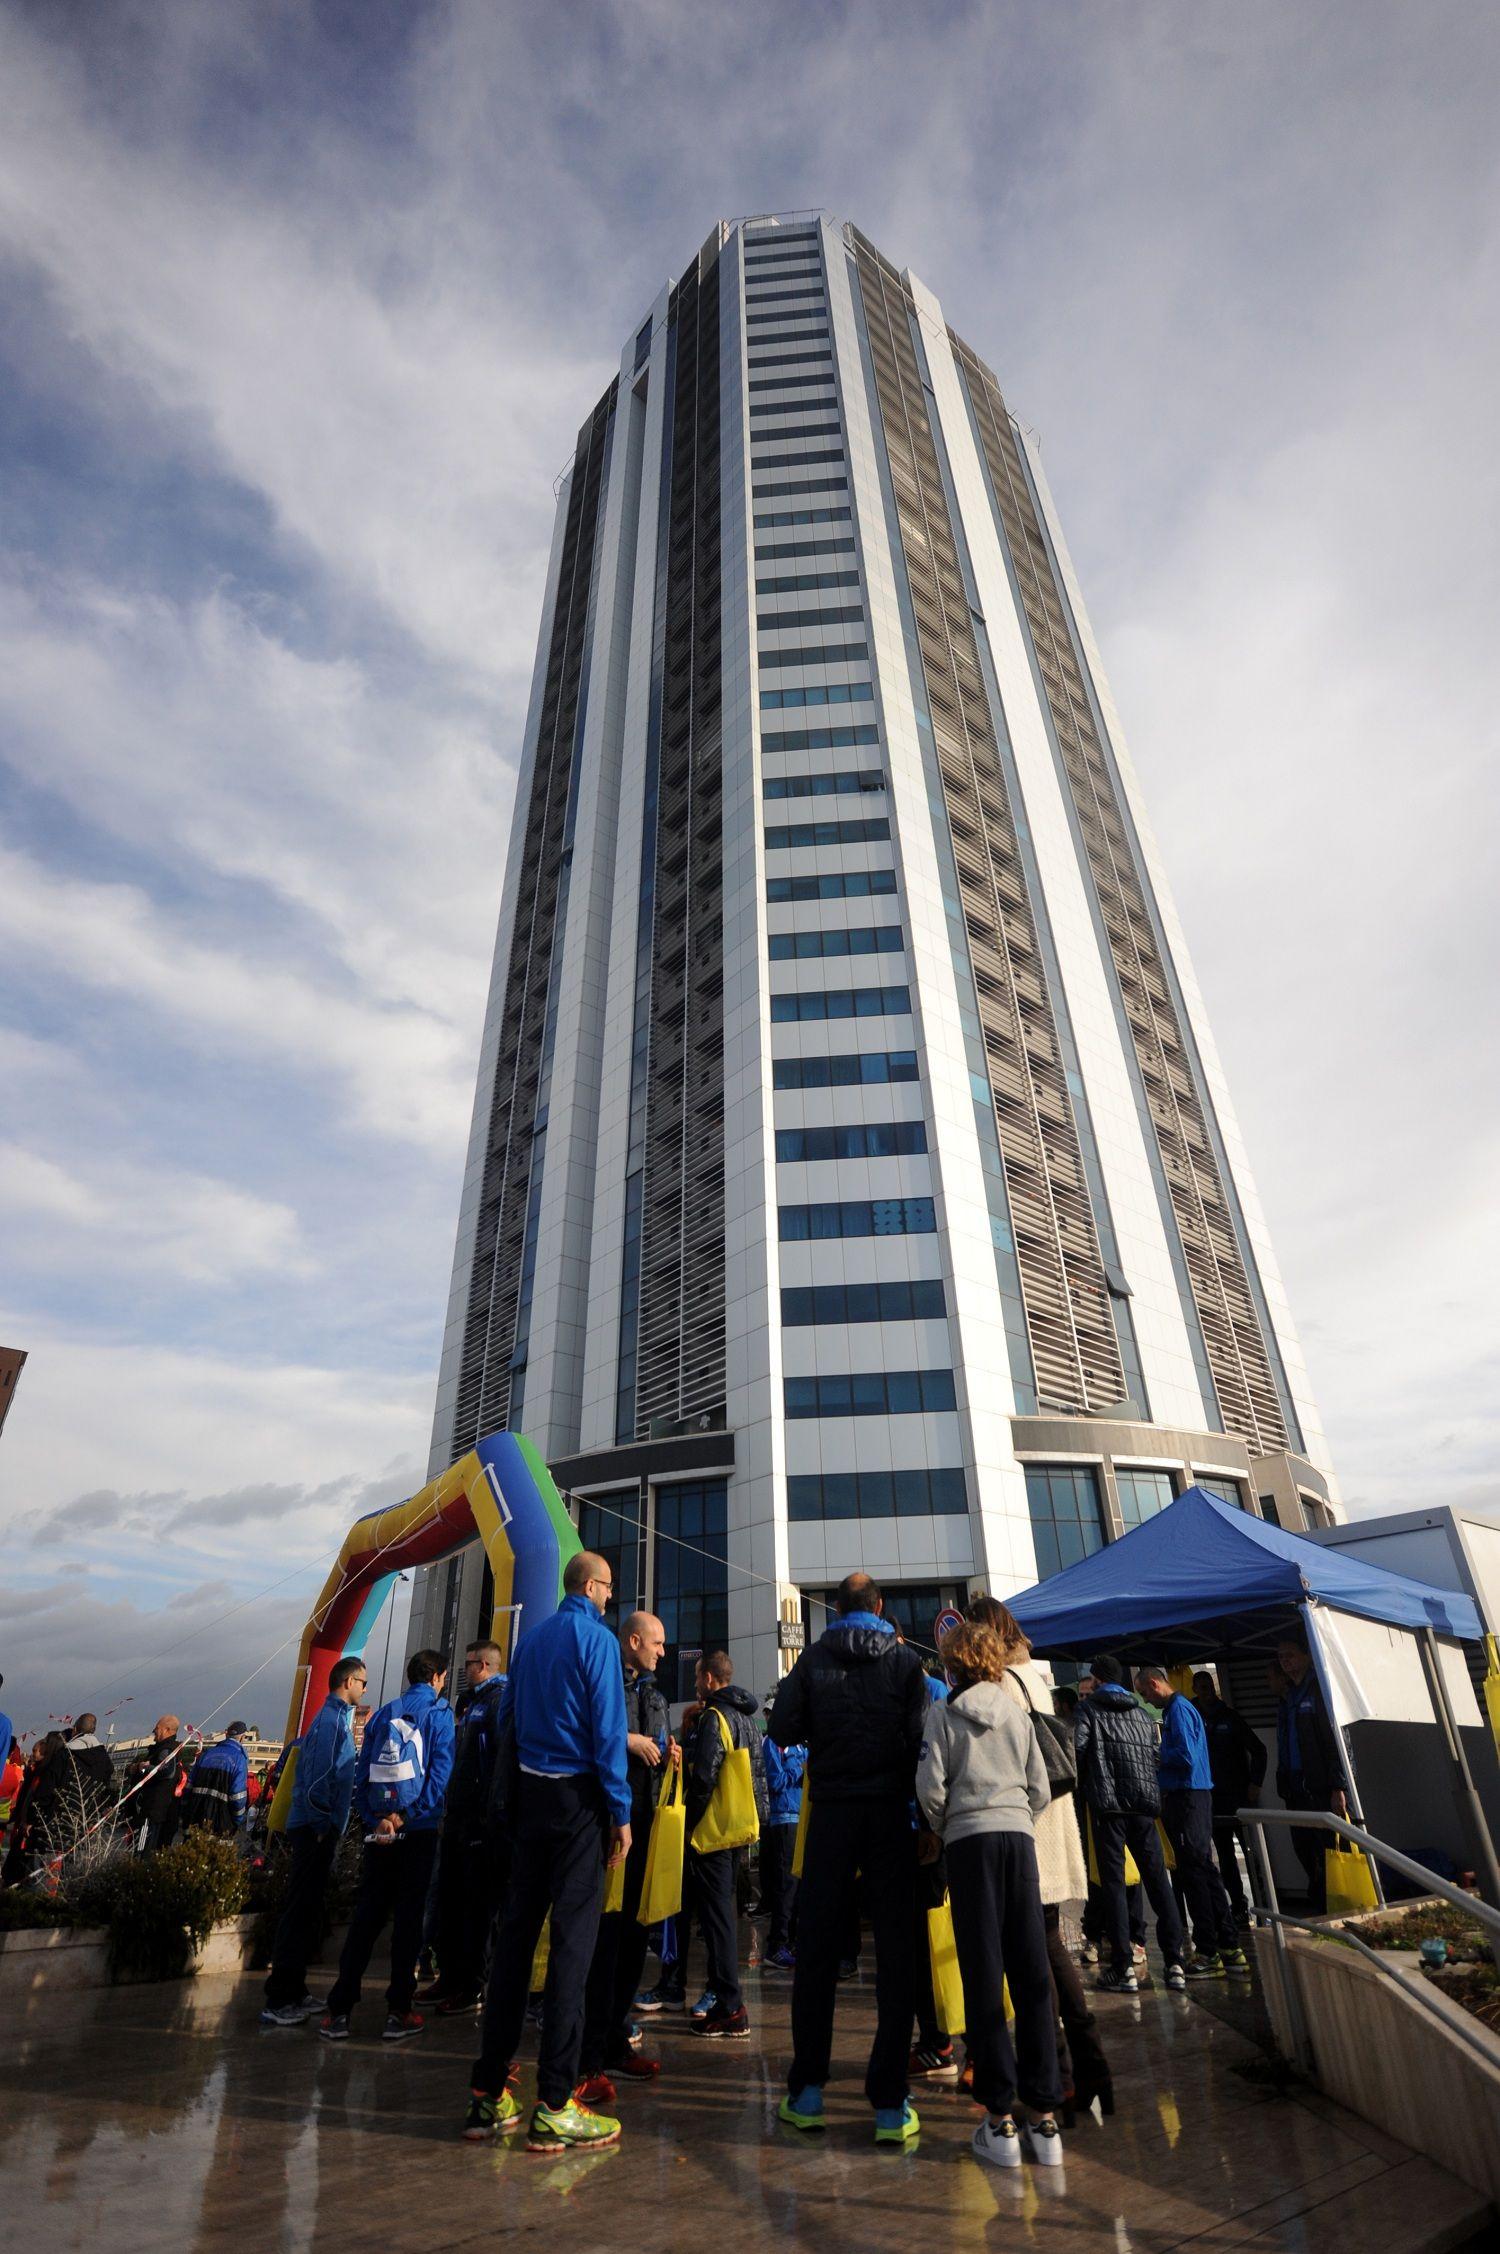 Sport - Latina Vertical Sprint, tutti di corsa in streaming sulla Torre Pontina